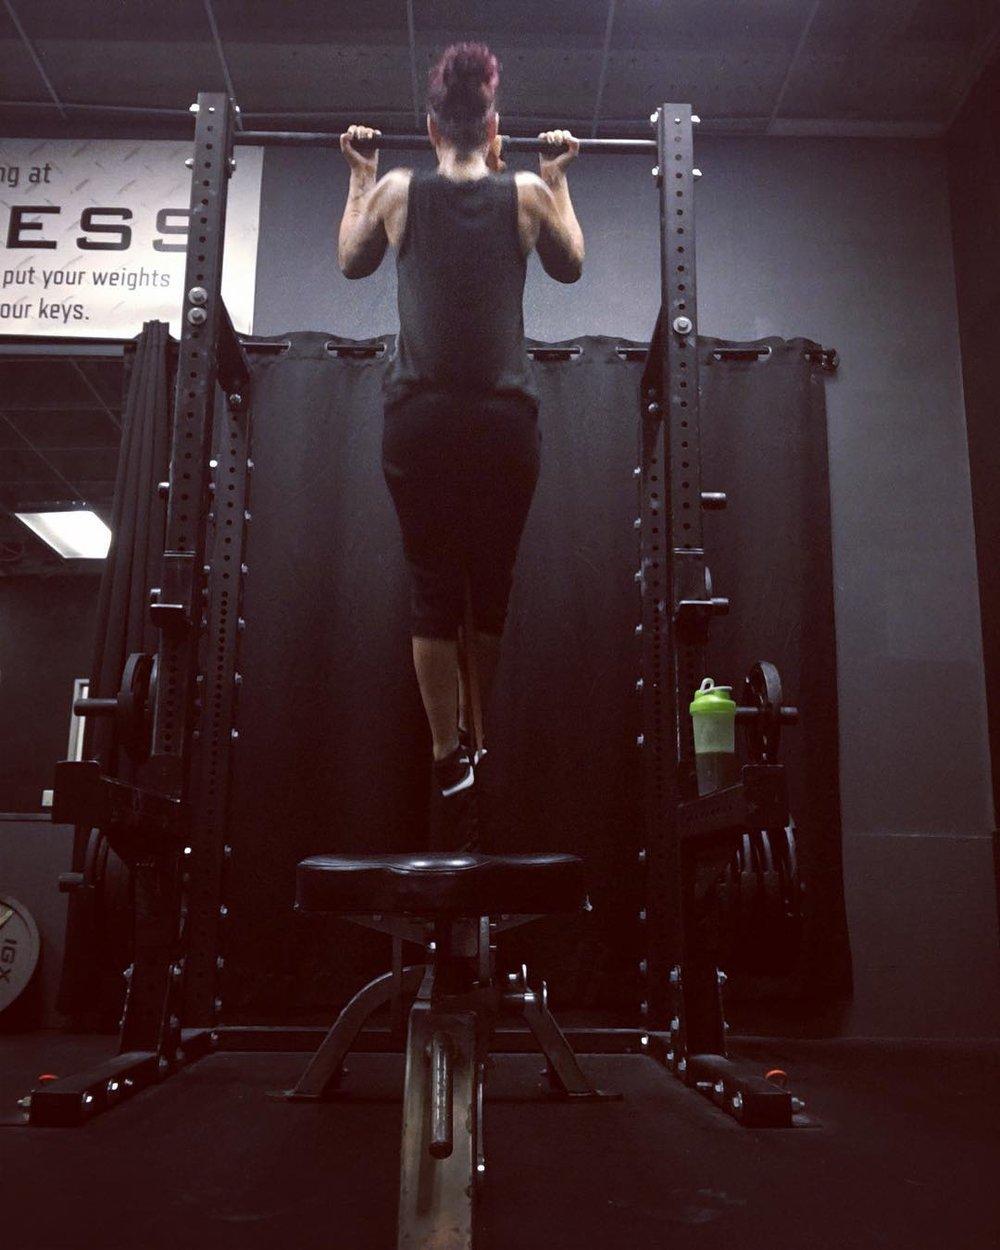 personal-trainer-laura-petersen-xp-fitness-hilton-head.jpg